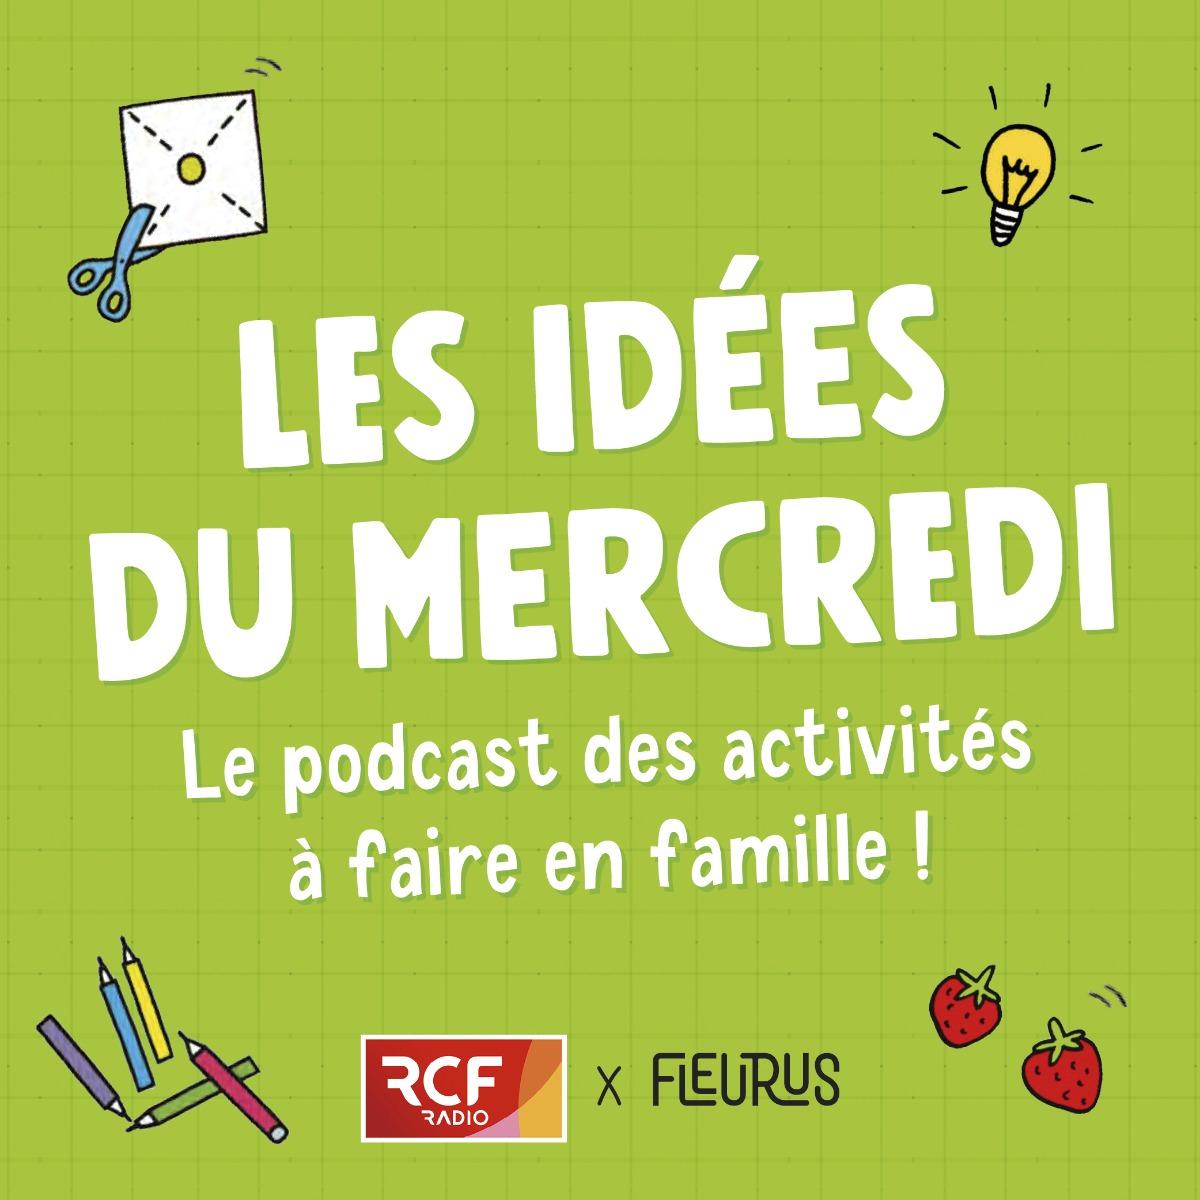 Logo podcast Les idées du mercredi